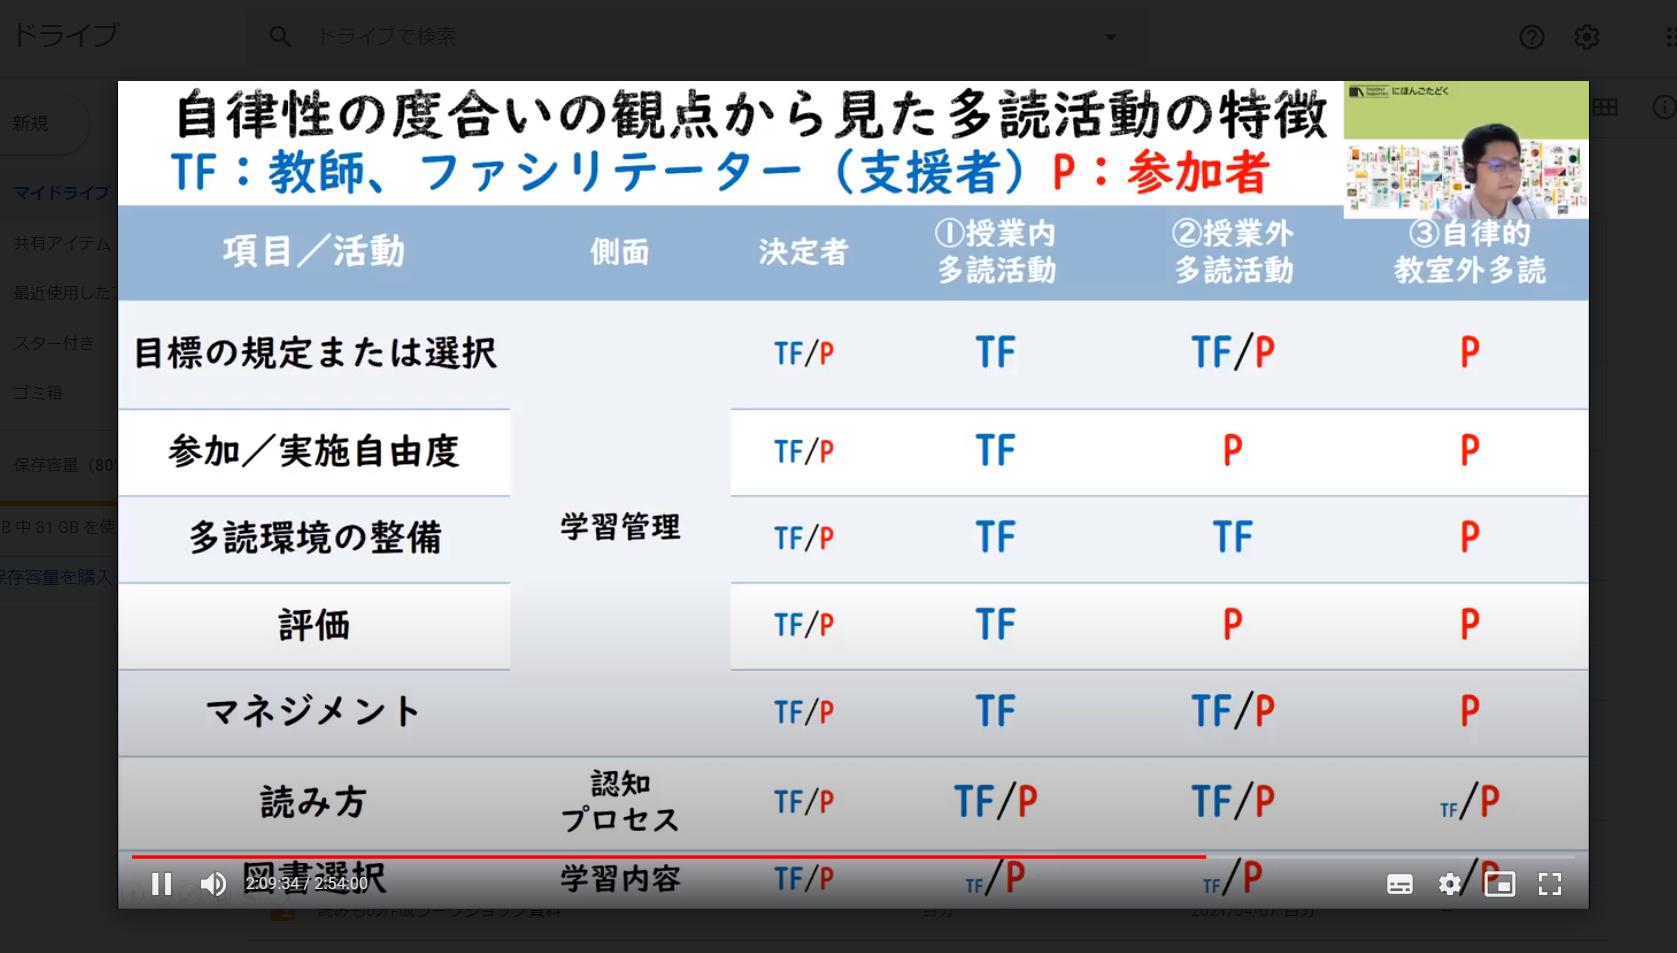 takahashi_sympo